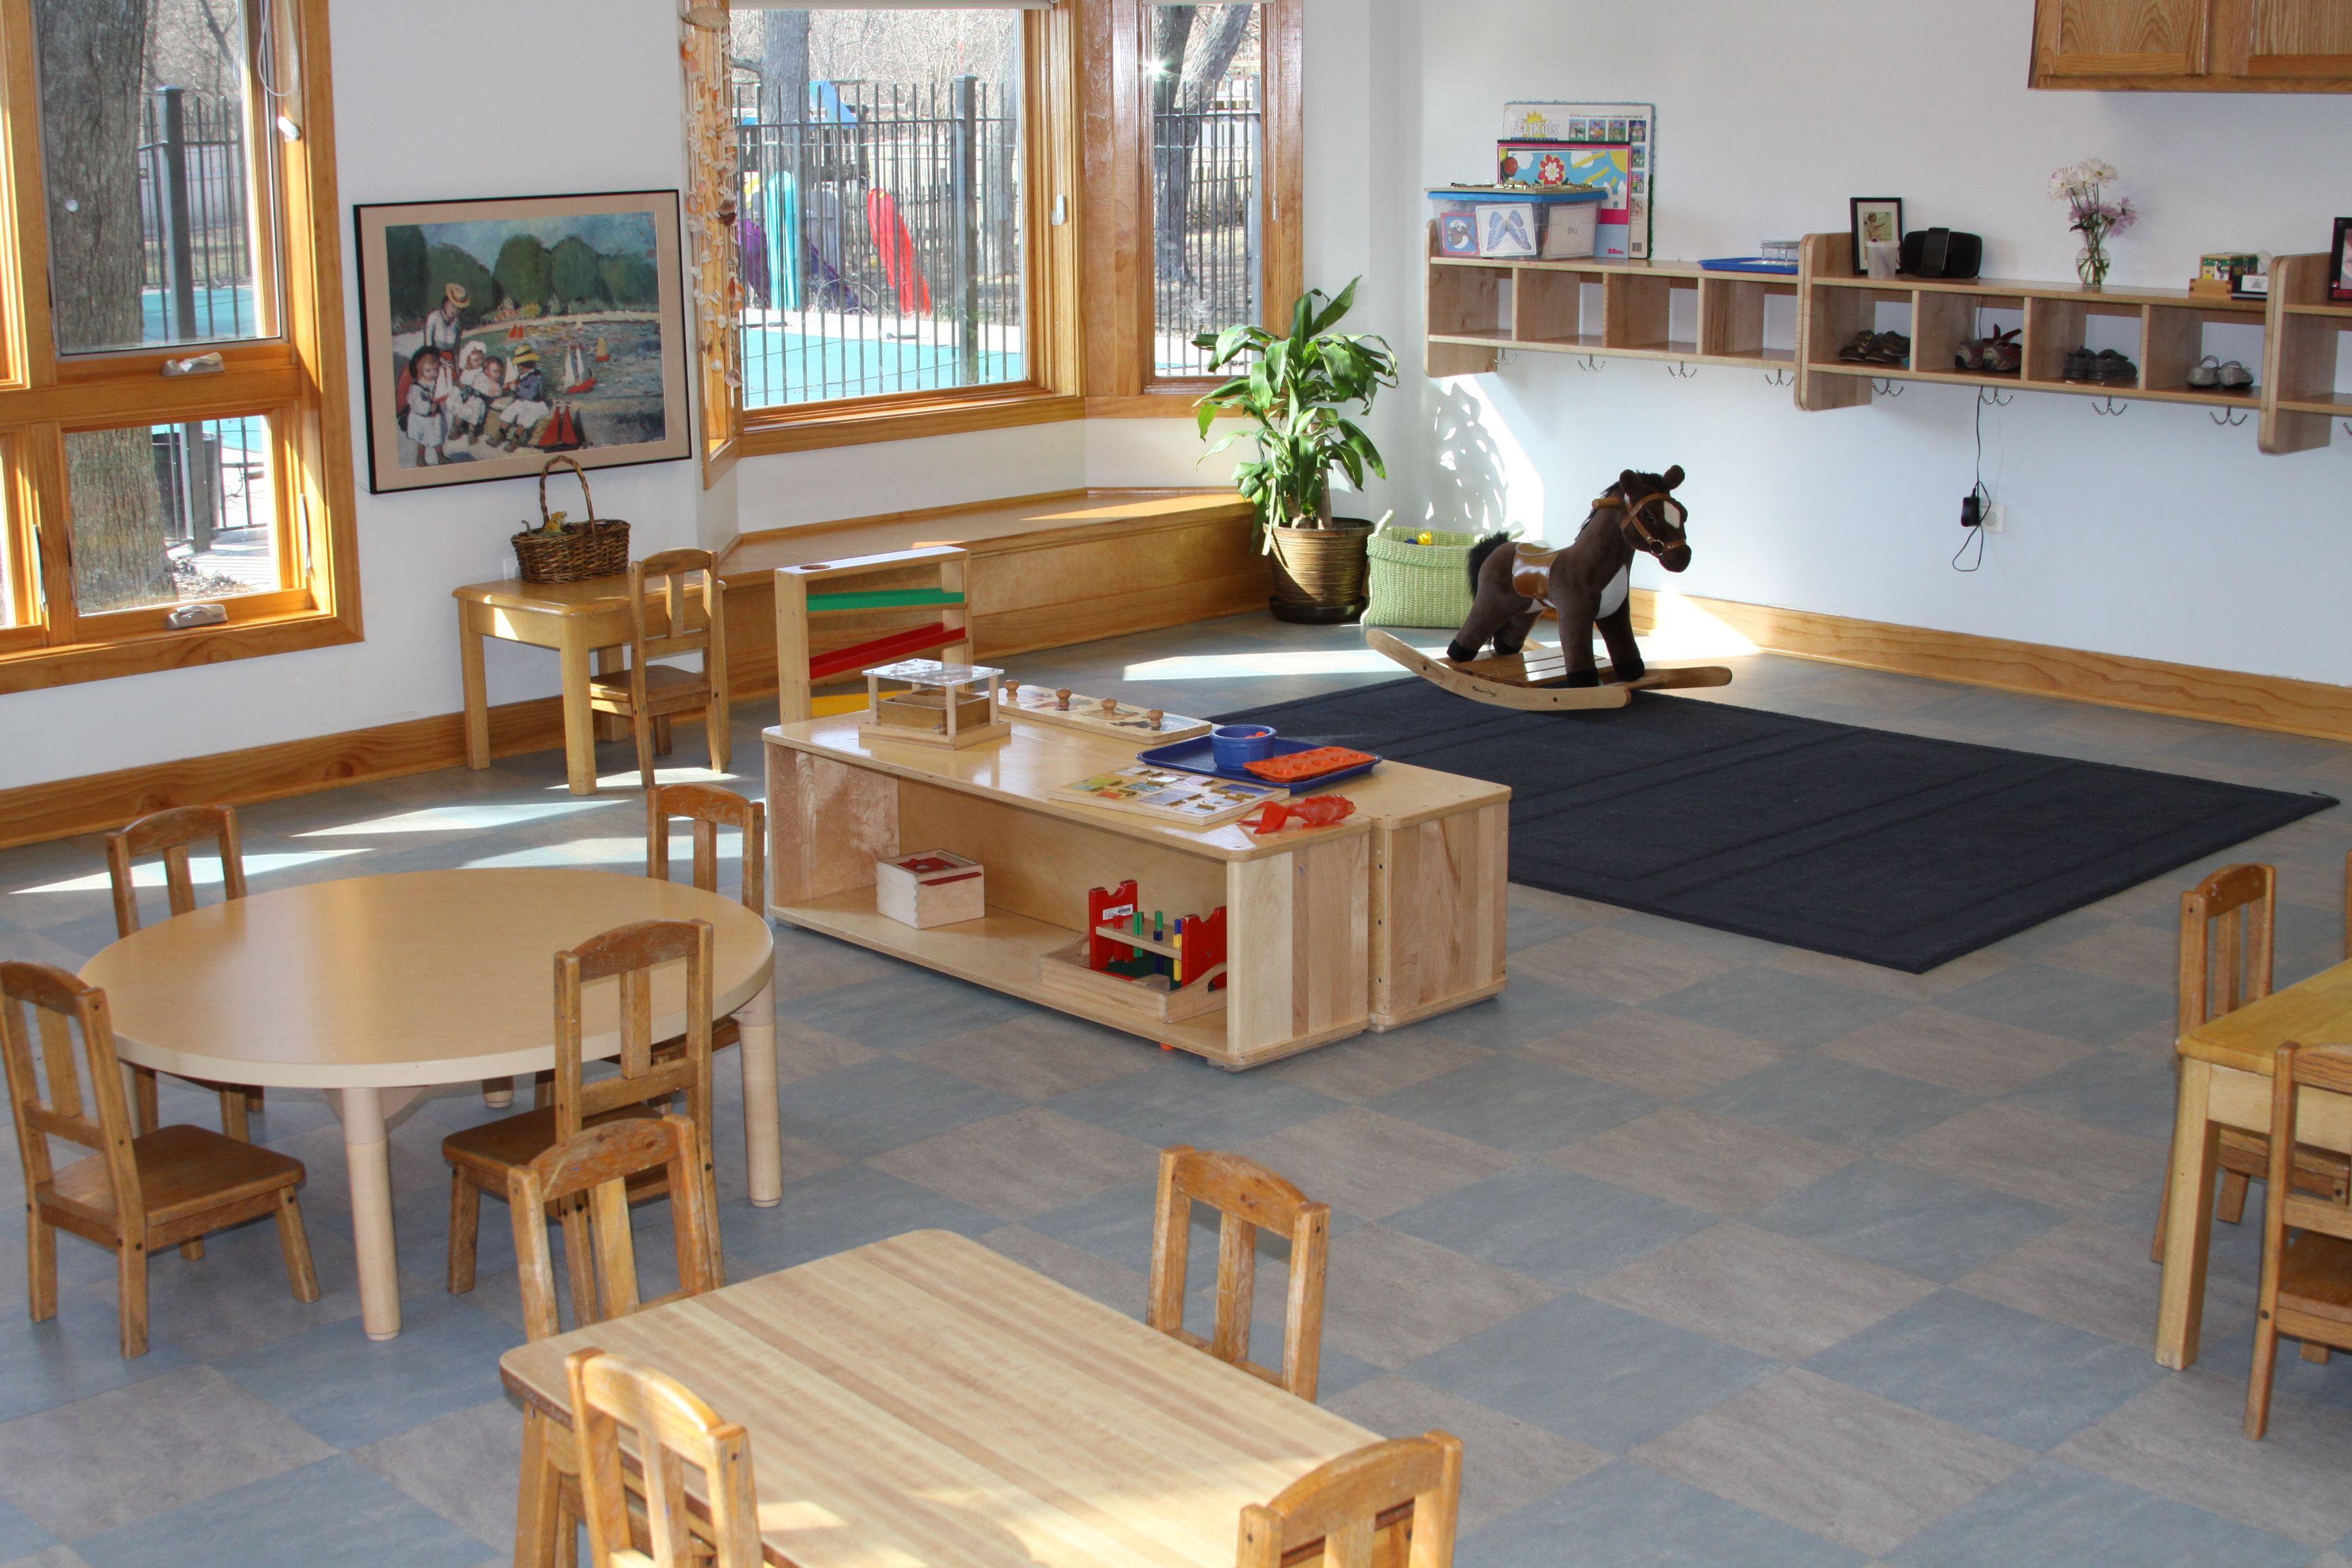 Montessori Classroom Design Pictures ~ Awesome montessori classroom design images